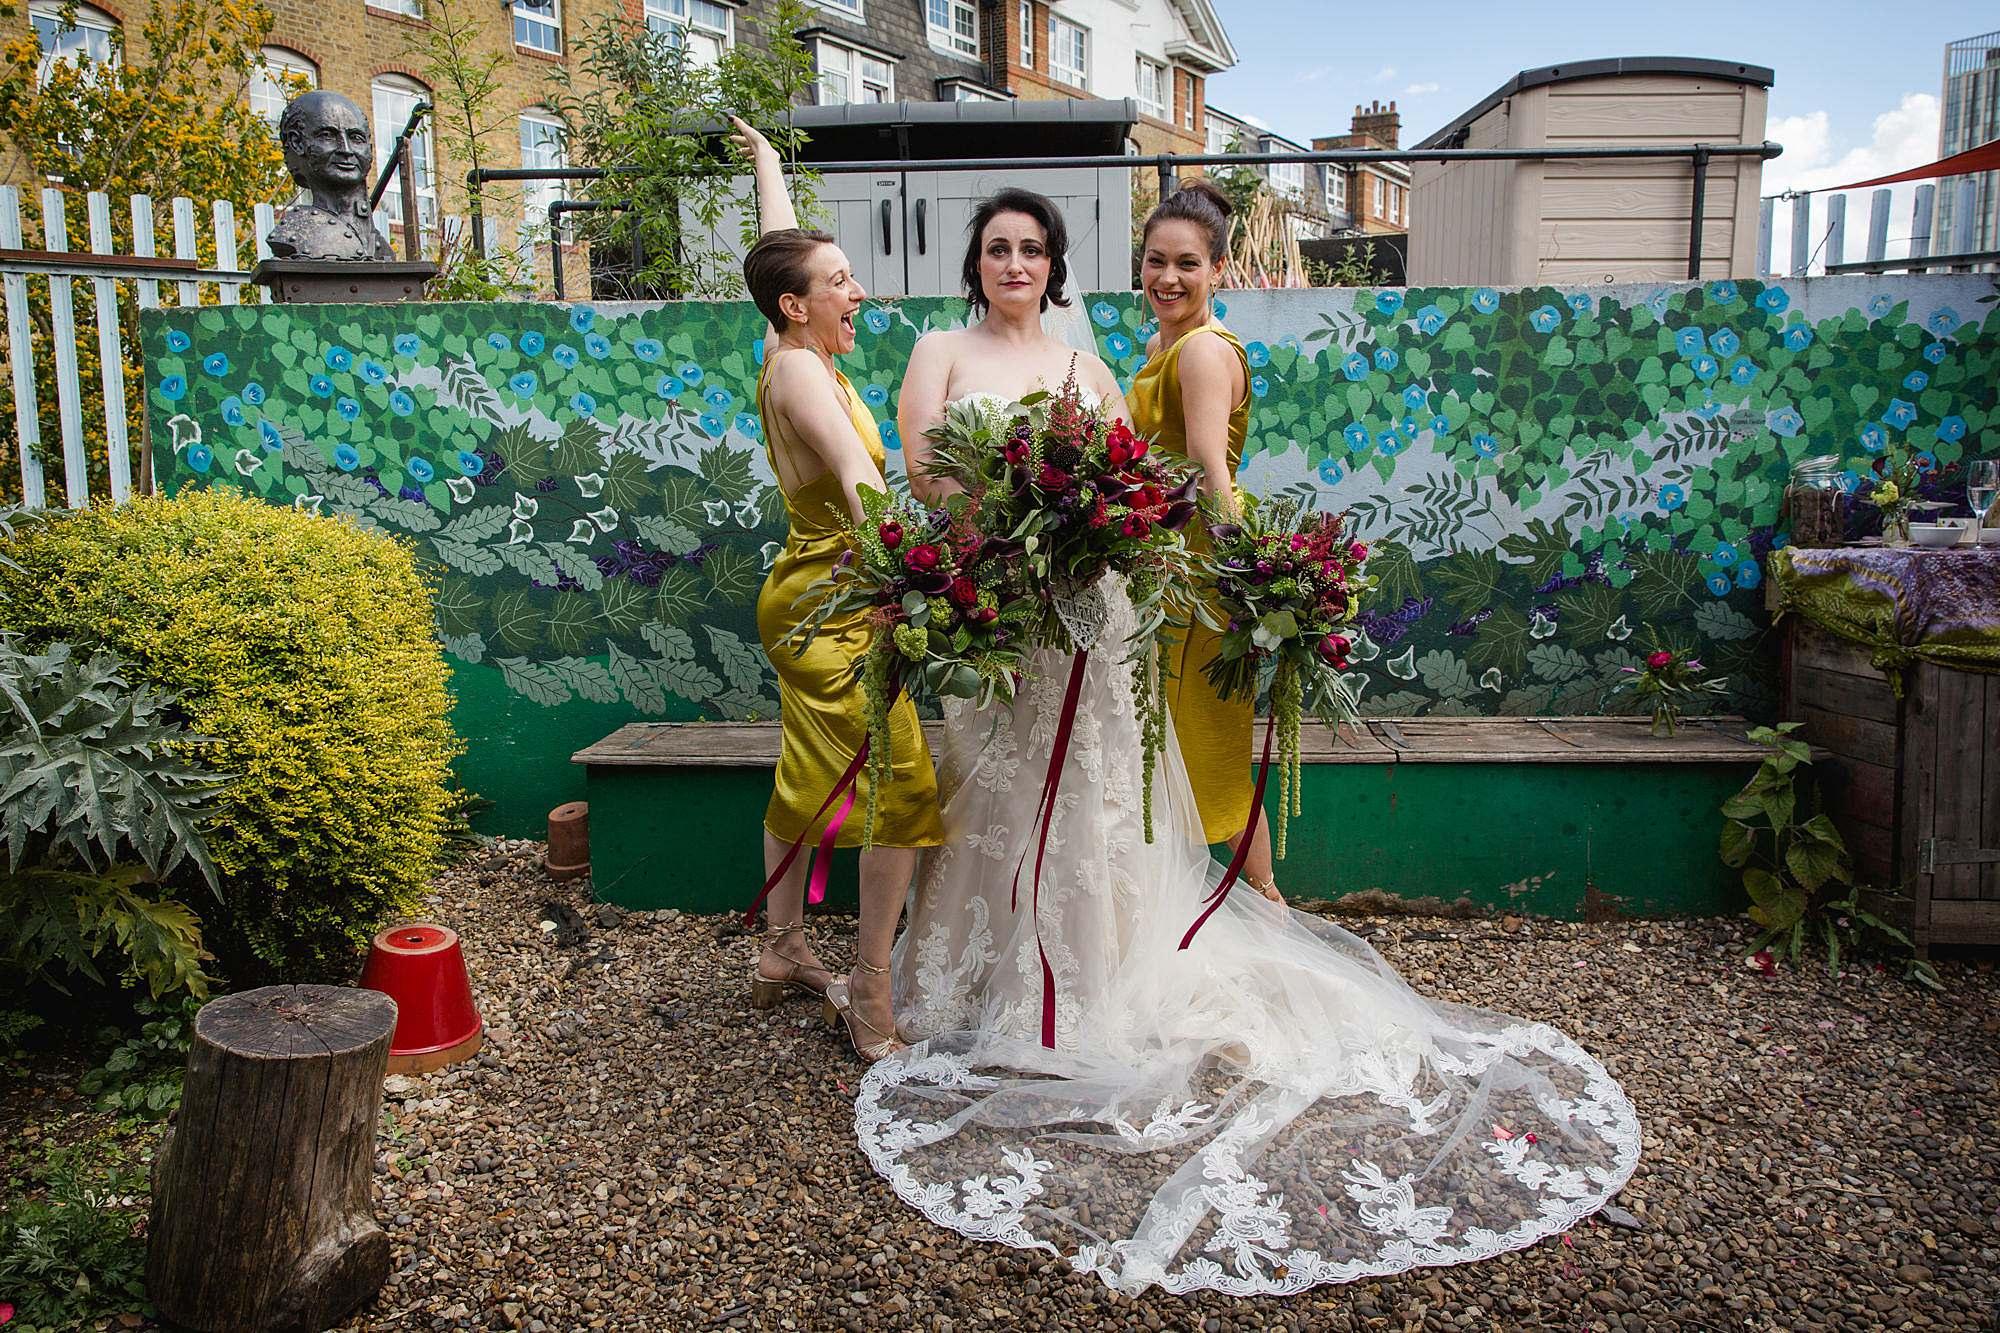 Brunel museum wedding fun bride and bridesmaids